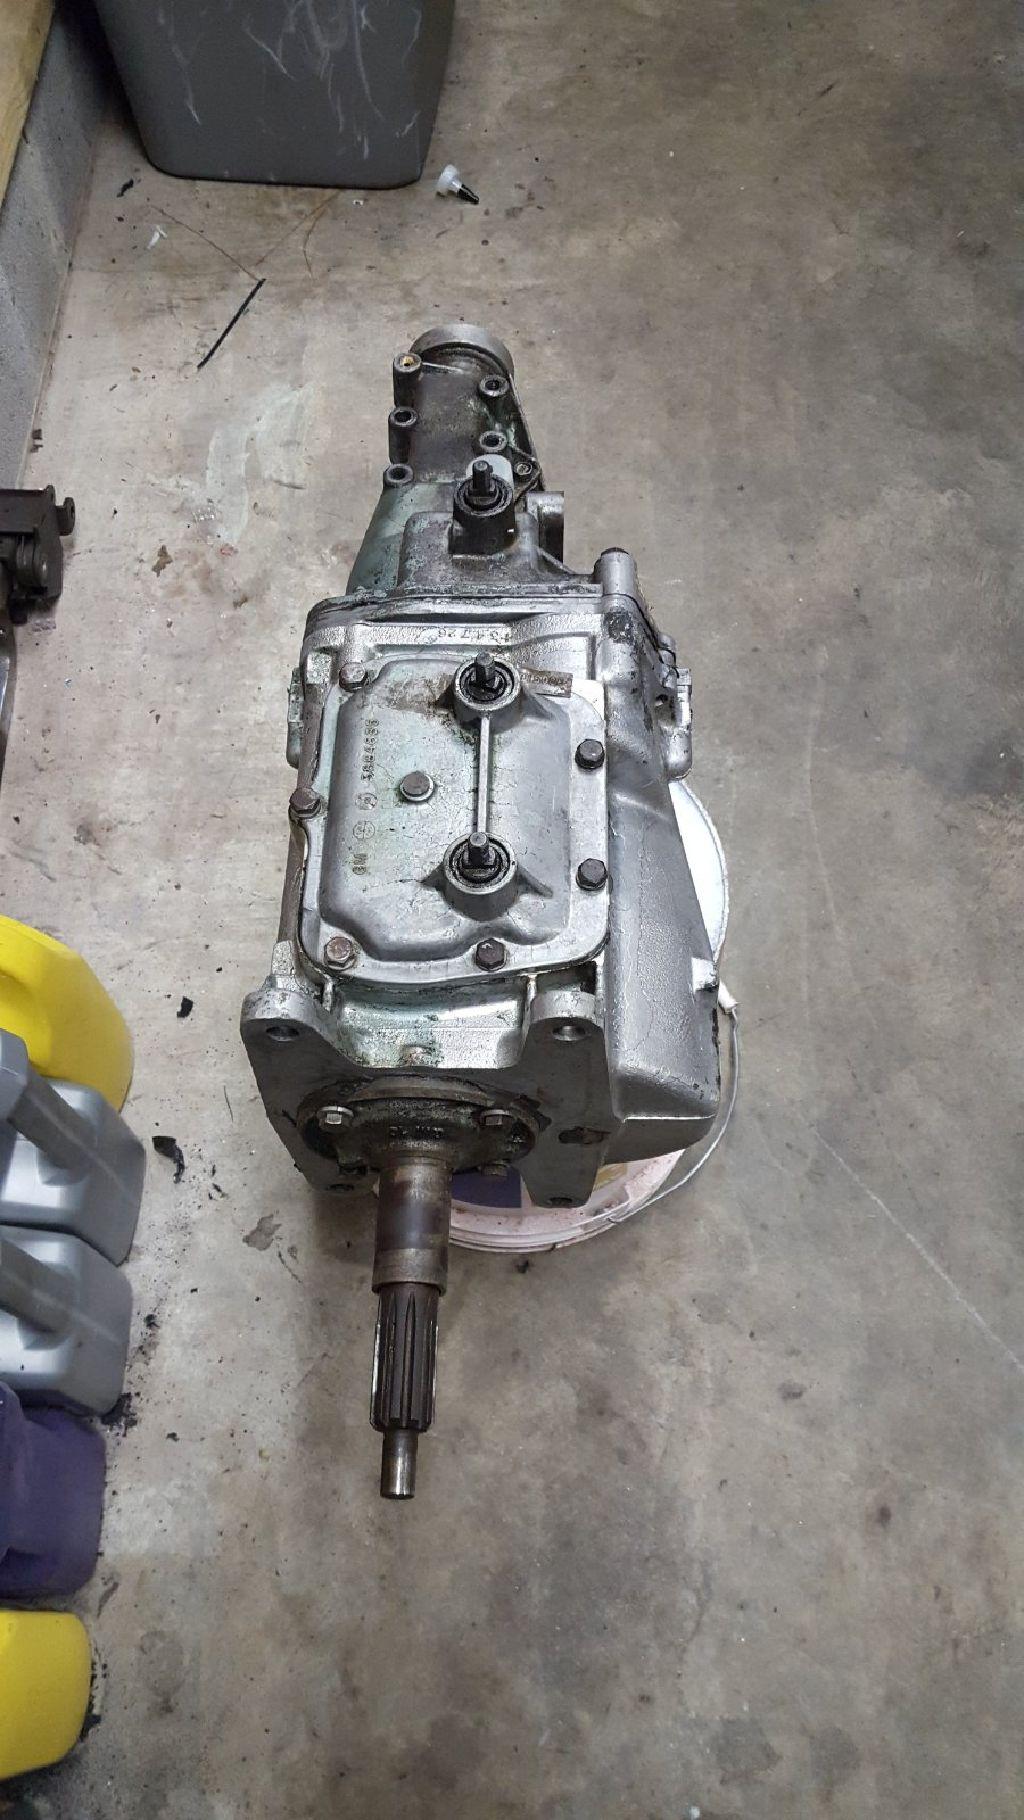 4 Speed Muncie Transmission